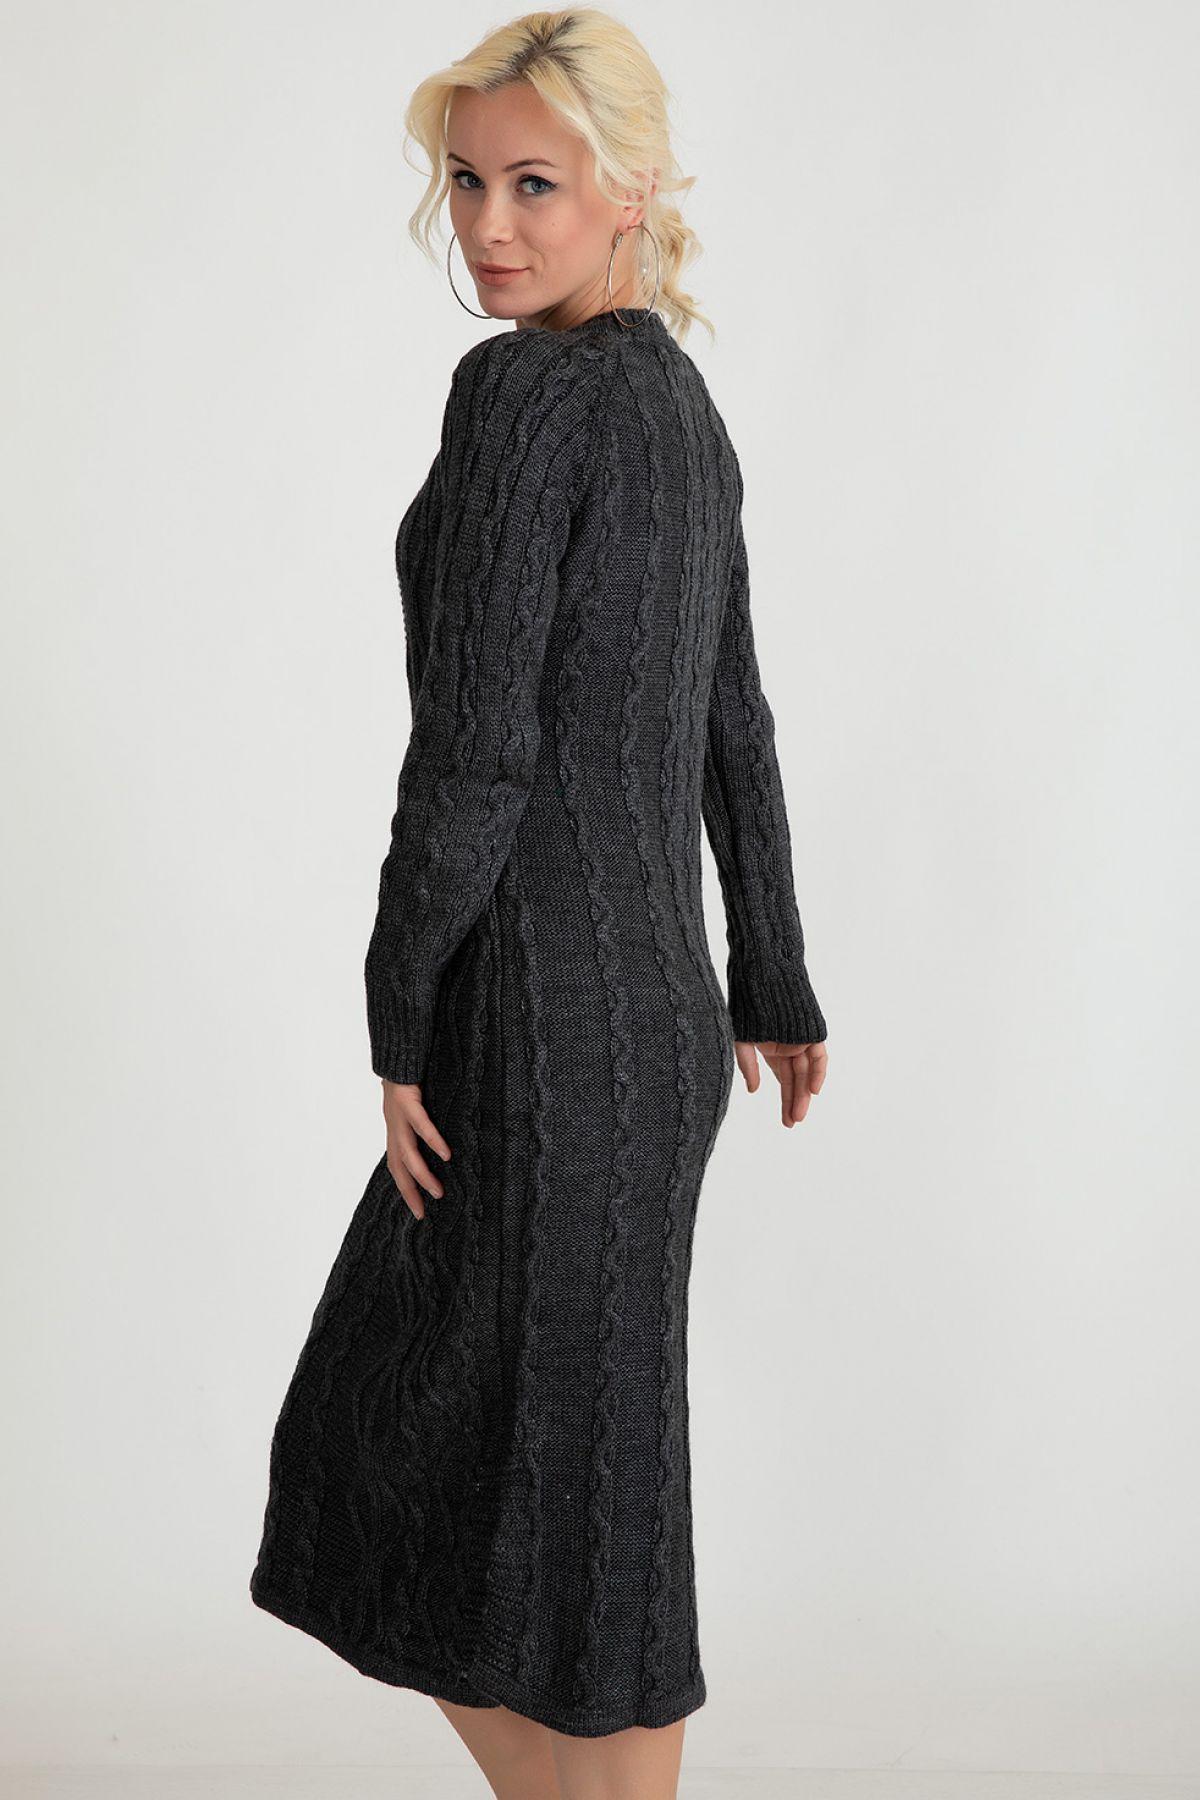 Dresses-Anthracite